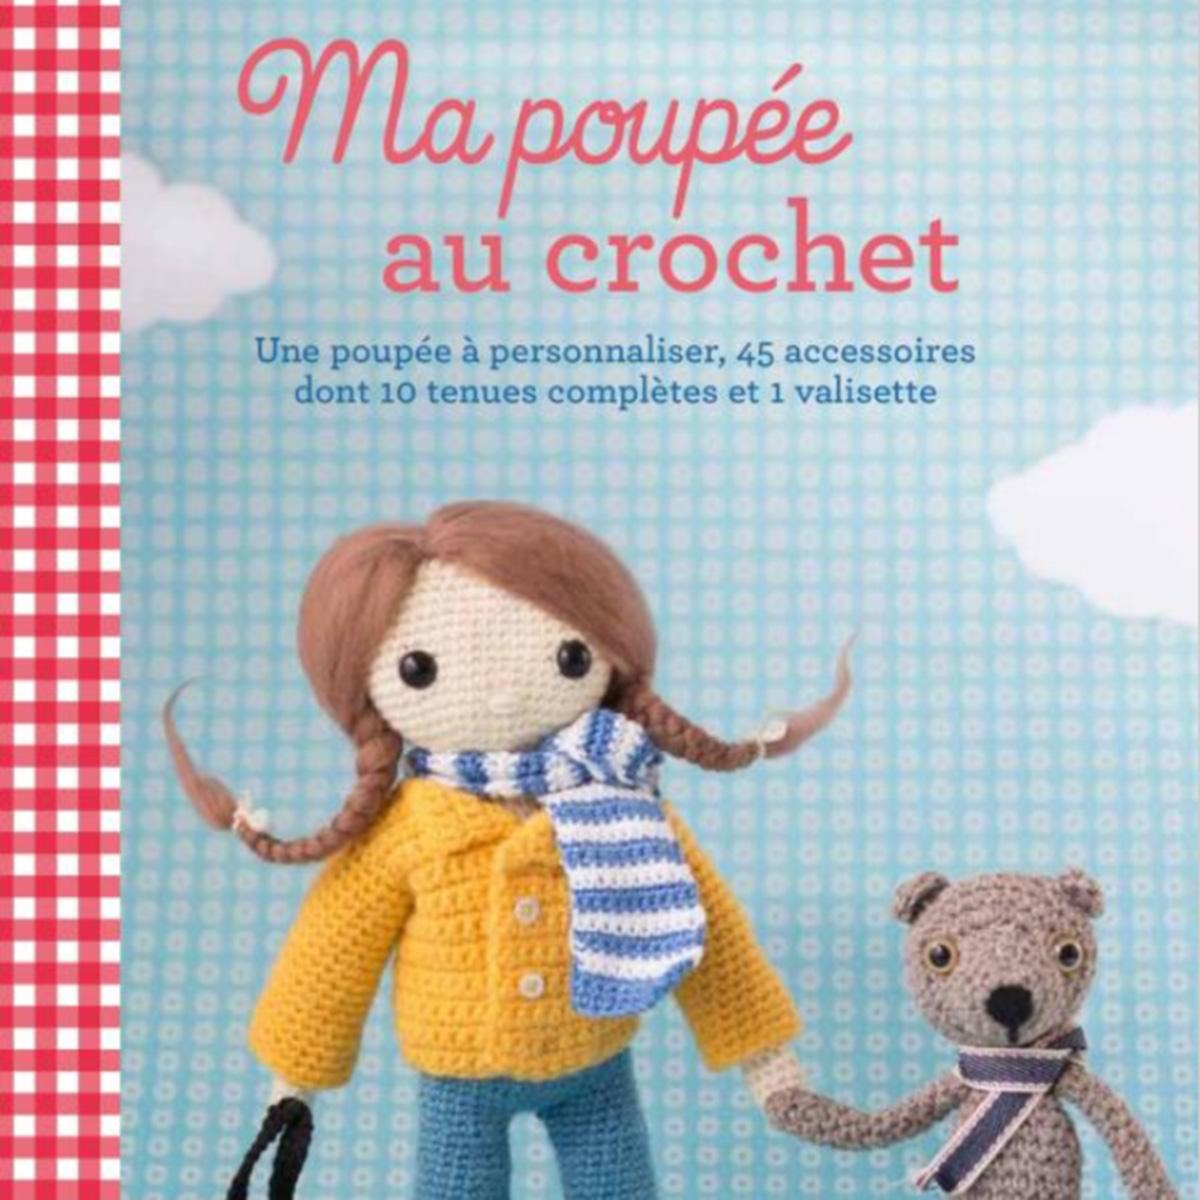 Amigurumi Parent And Baby Animals Free Download : Amigurumi Parent and Baby Animals.pdf - Amigurumi ...